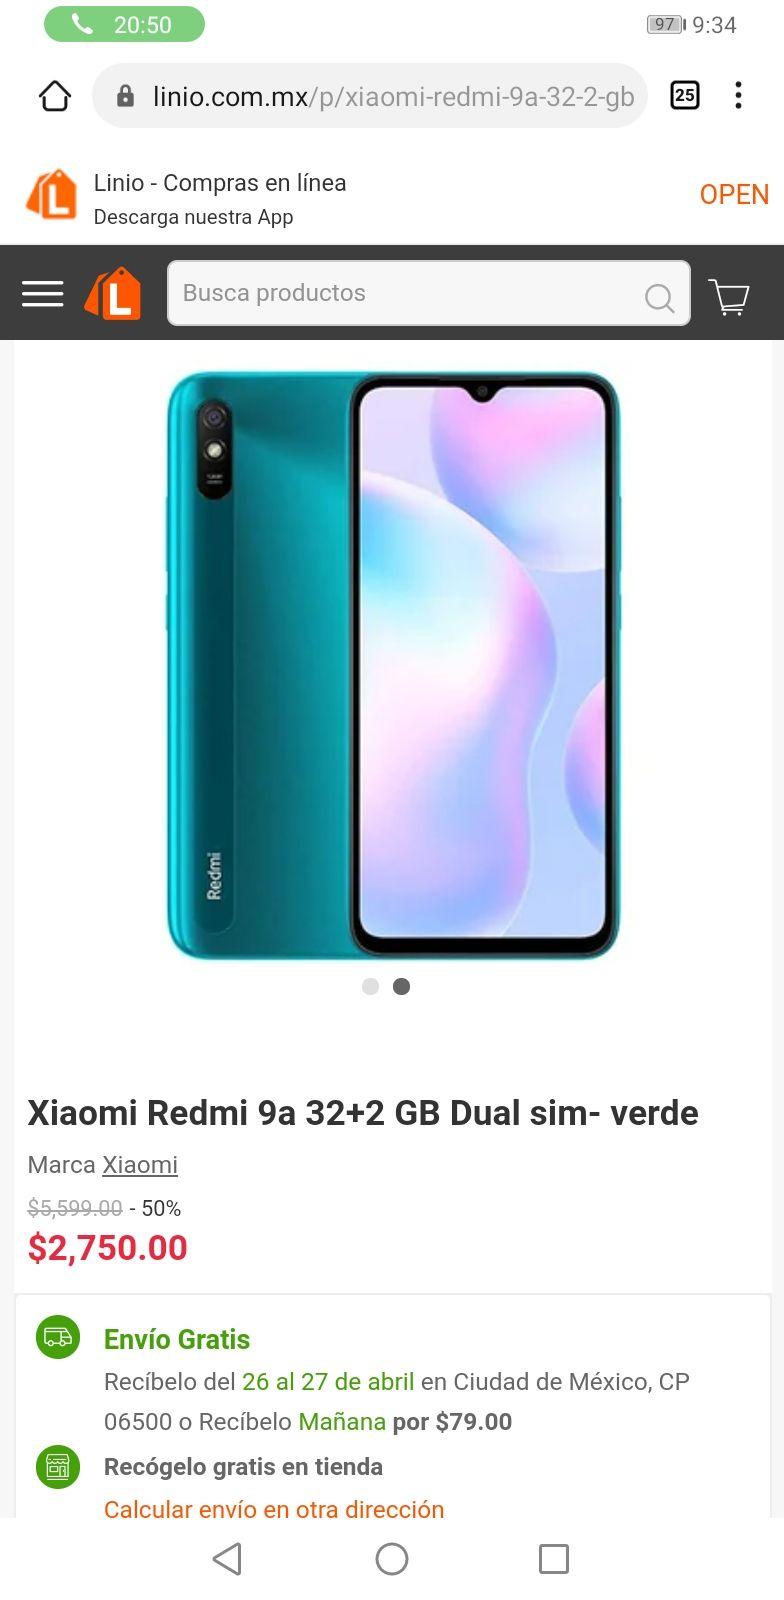 Linio: Xiaomi Redmi 9a 32+2 GB Dual sim- verde